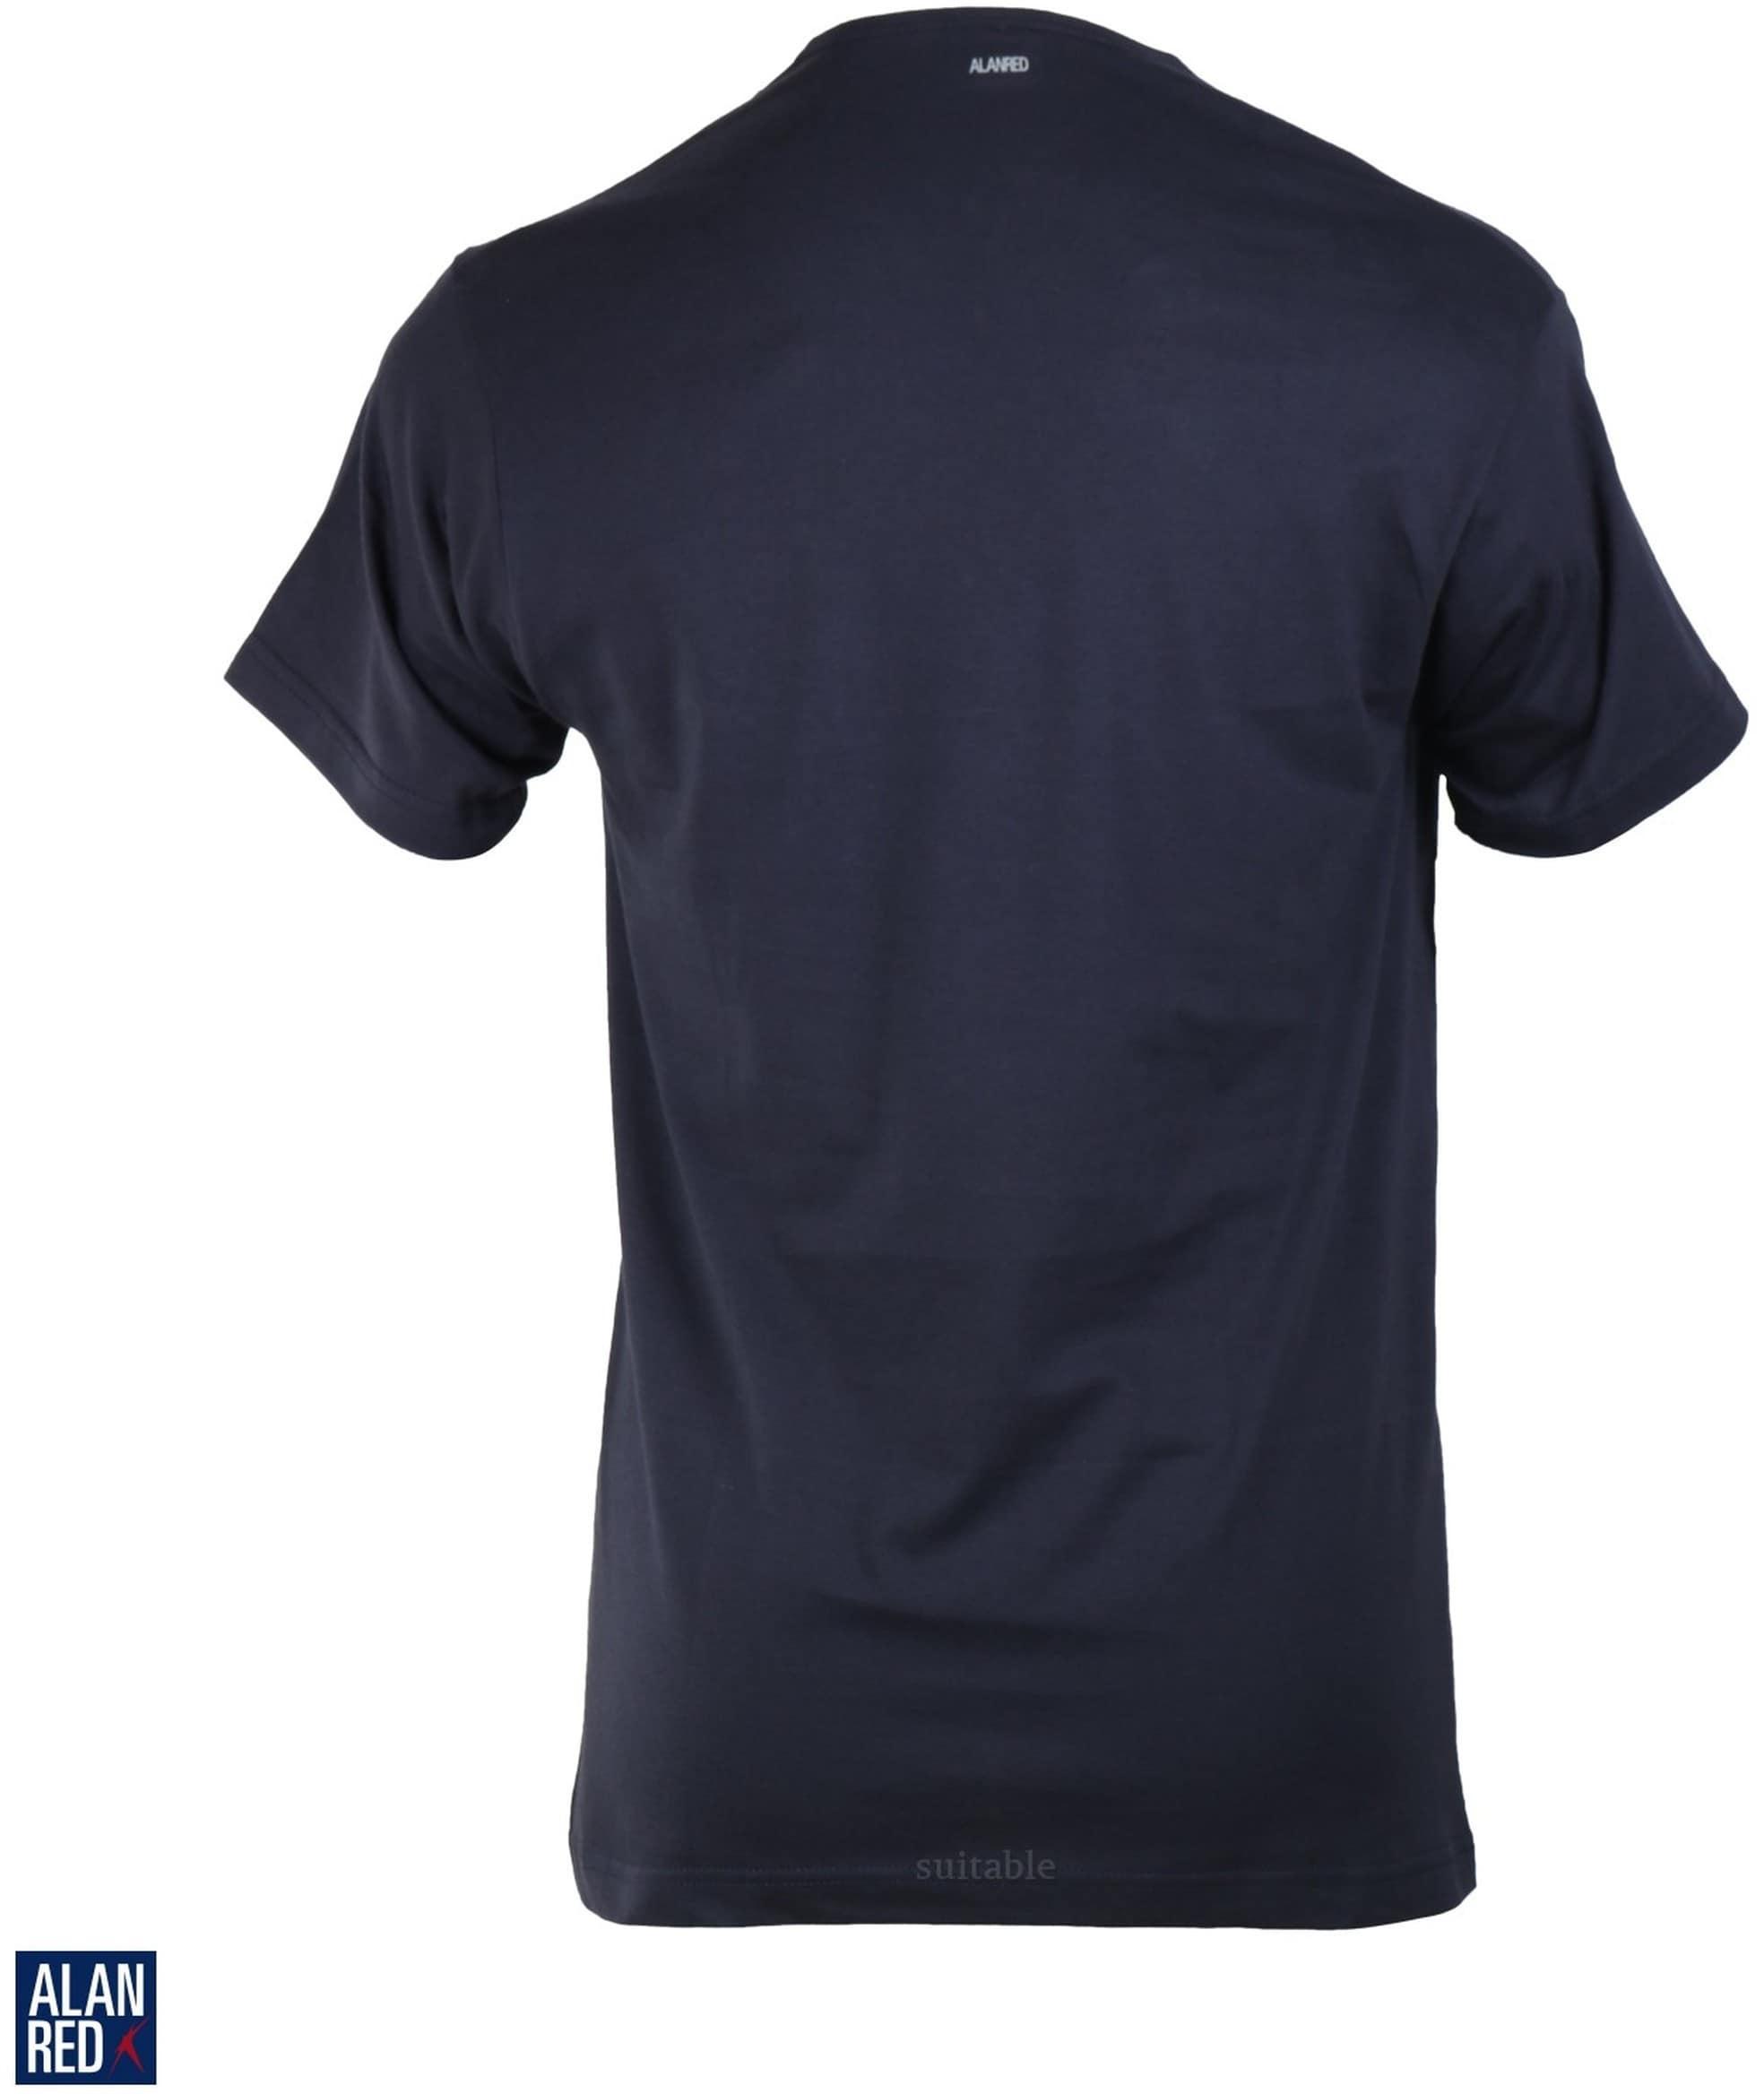 Alan Red Vermont T-shirt V-Neck Navy 1-Pack foto 1